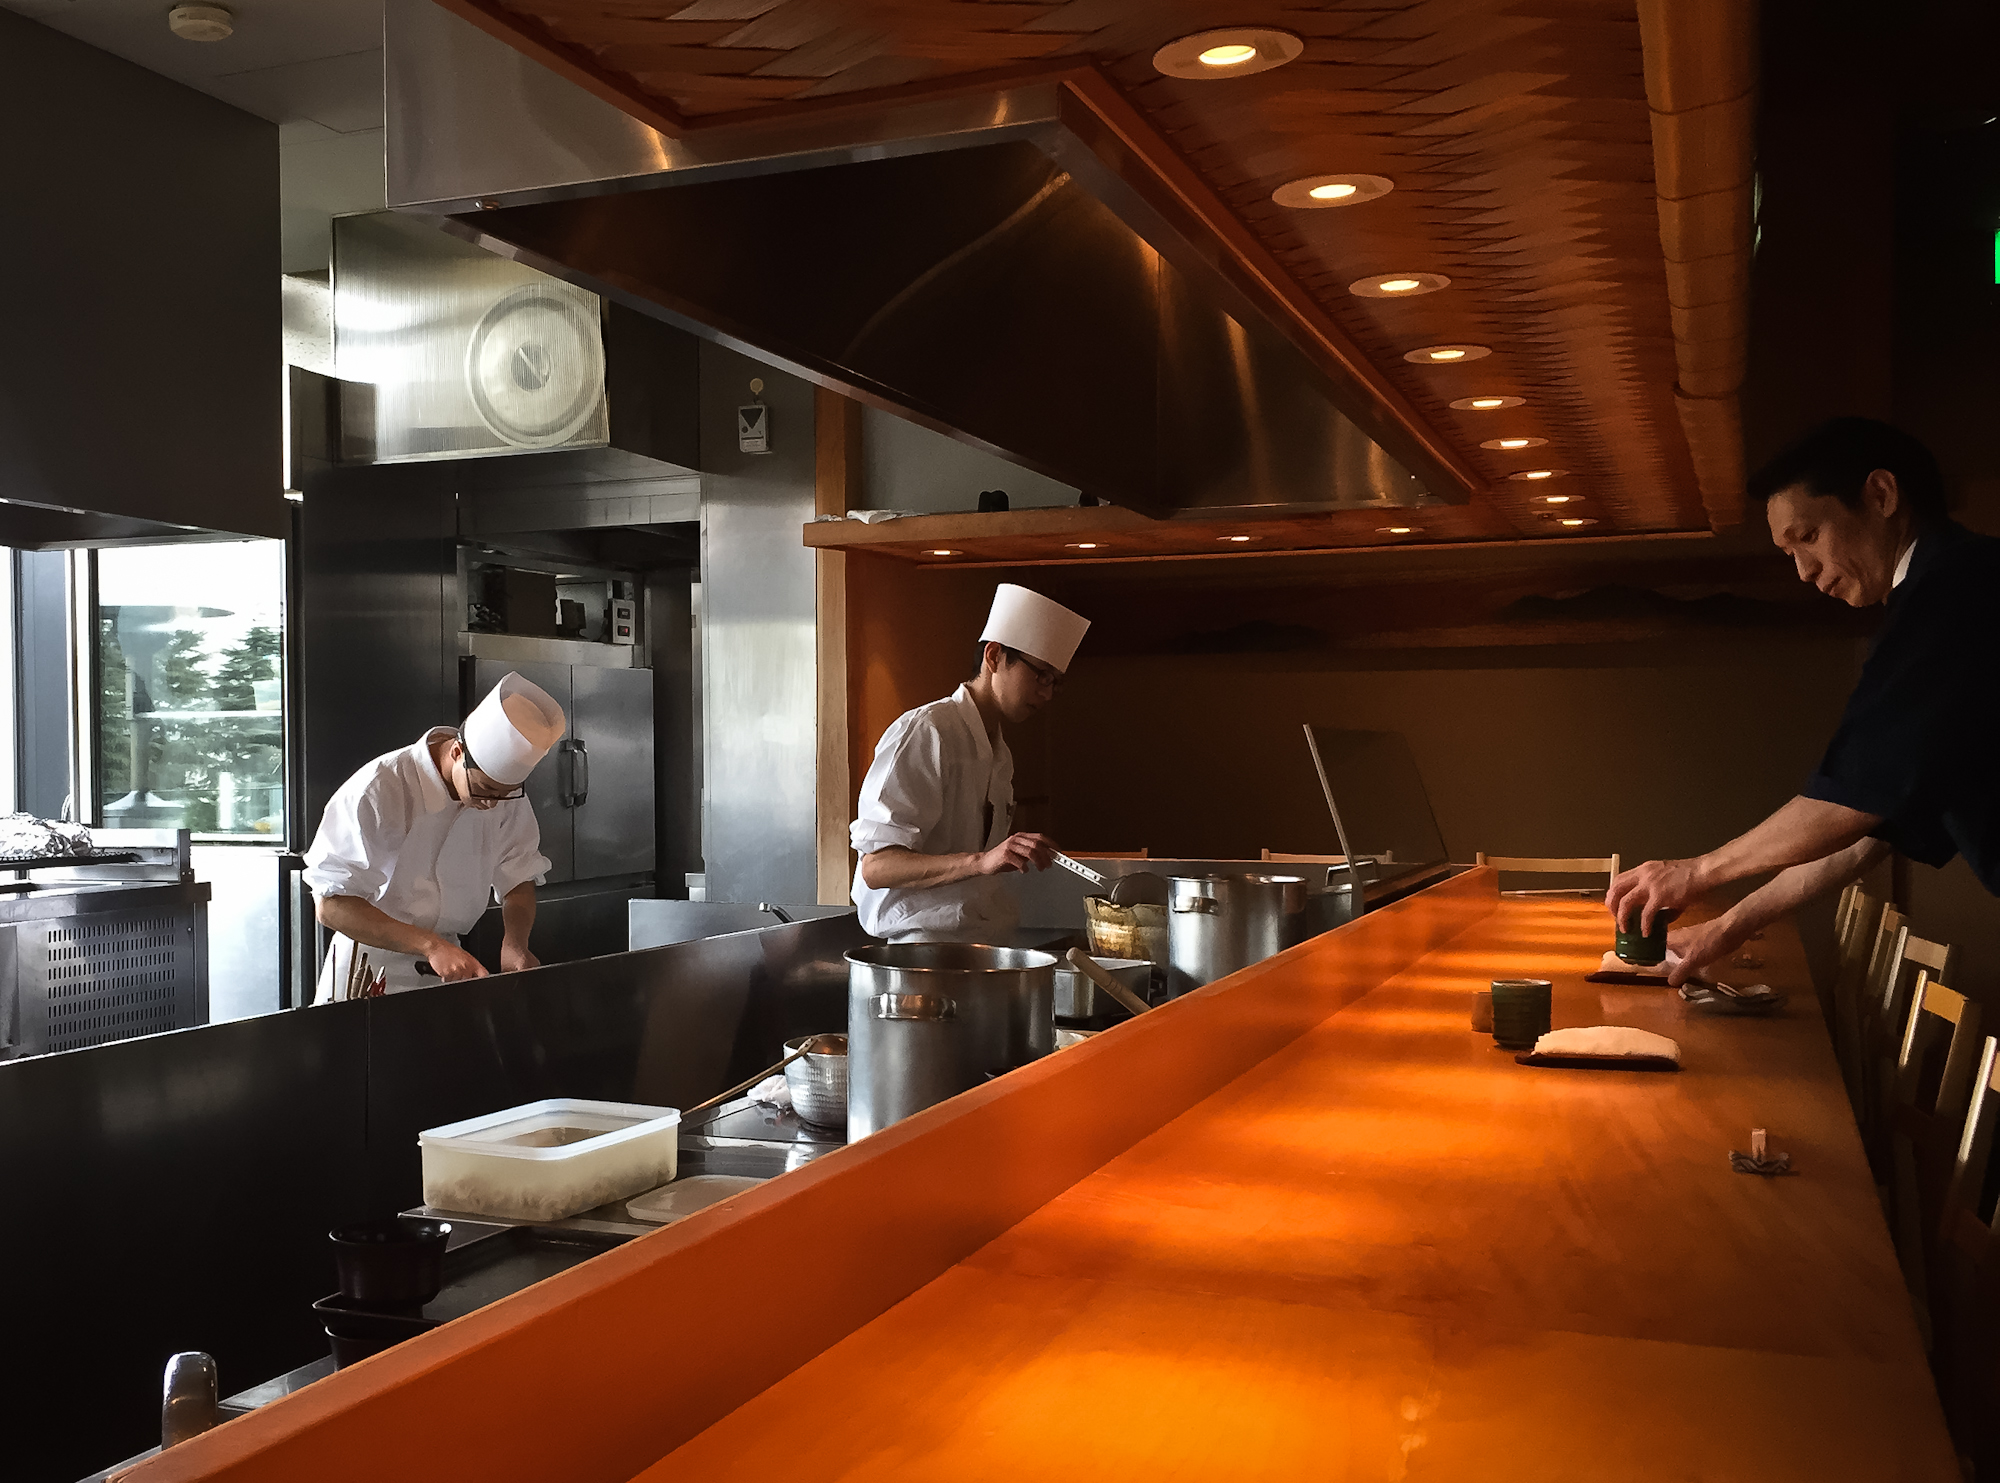 Tan-etsu Restaurant. Tokyo Midtown.